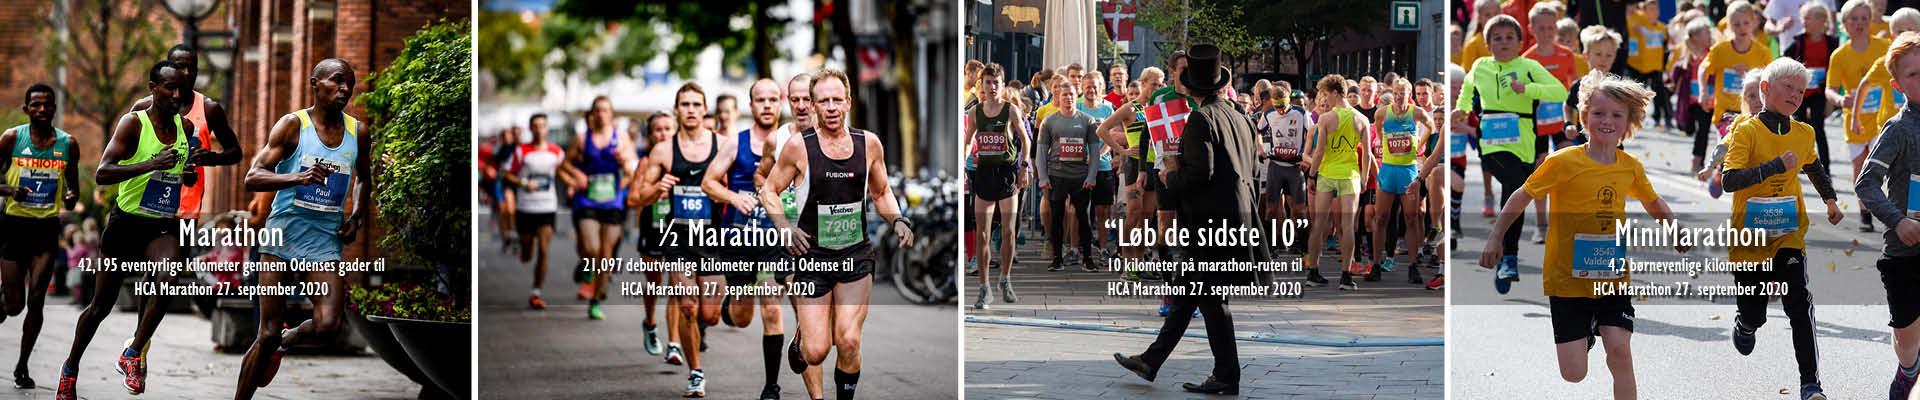 Danmarks eventyrlige Marathon